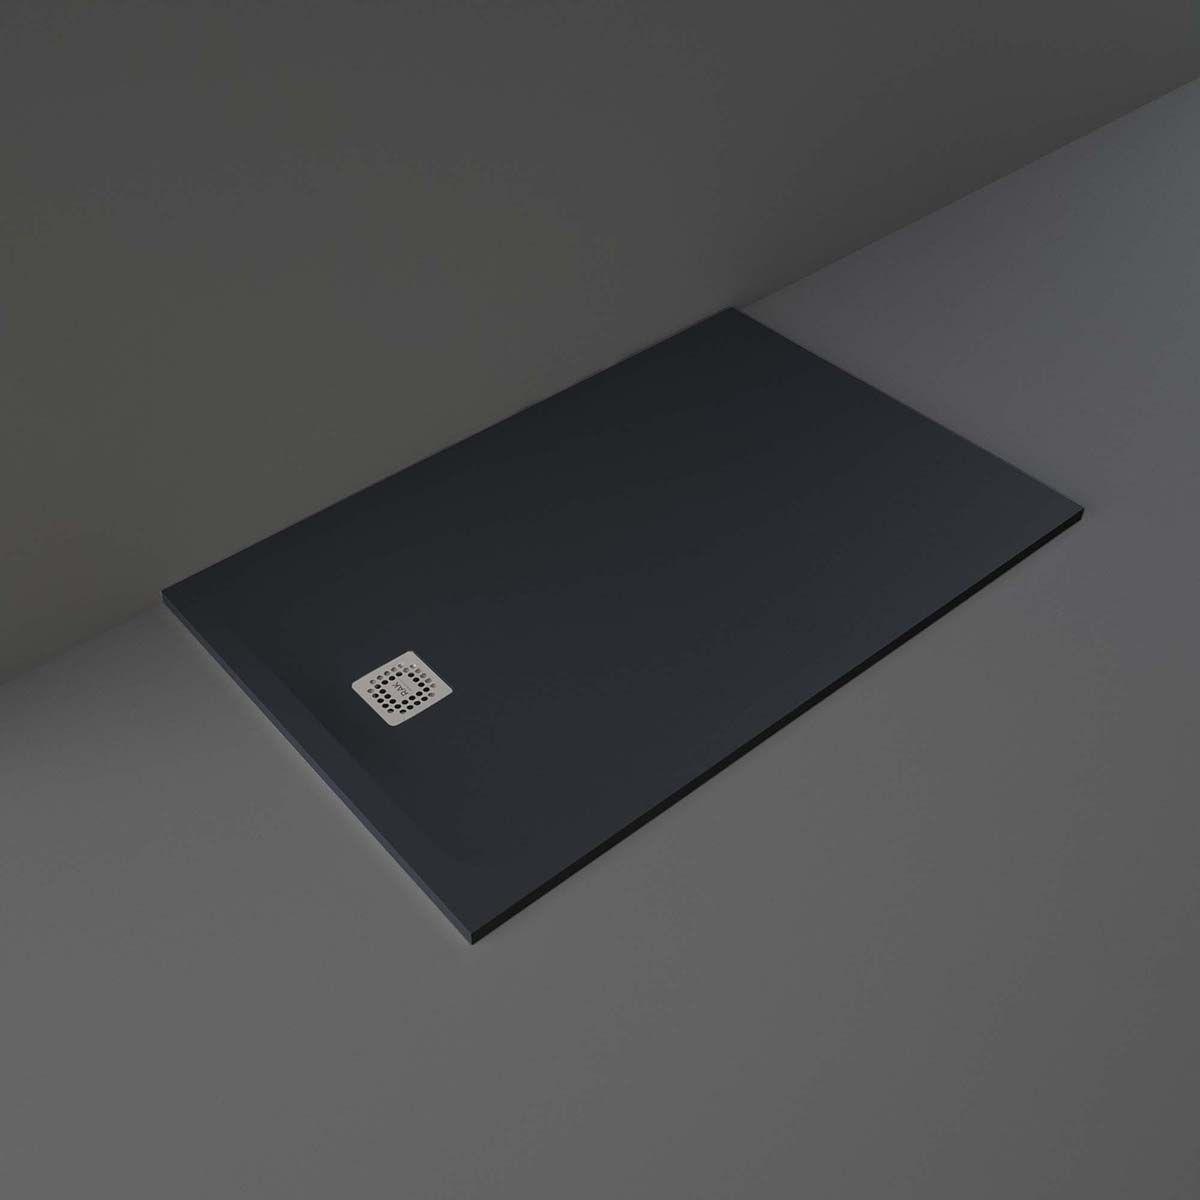 RAK Feeling Black Rectangular Shower Tray 1400 x 800mm